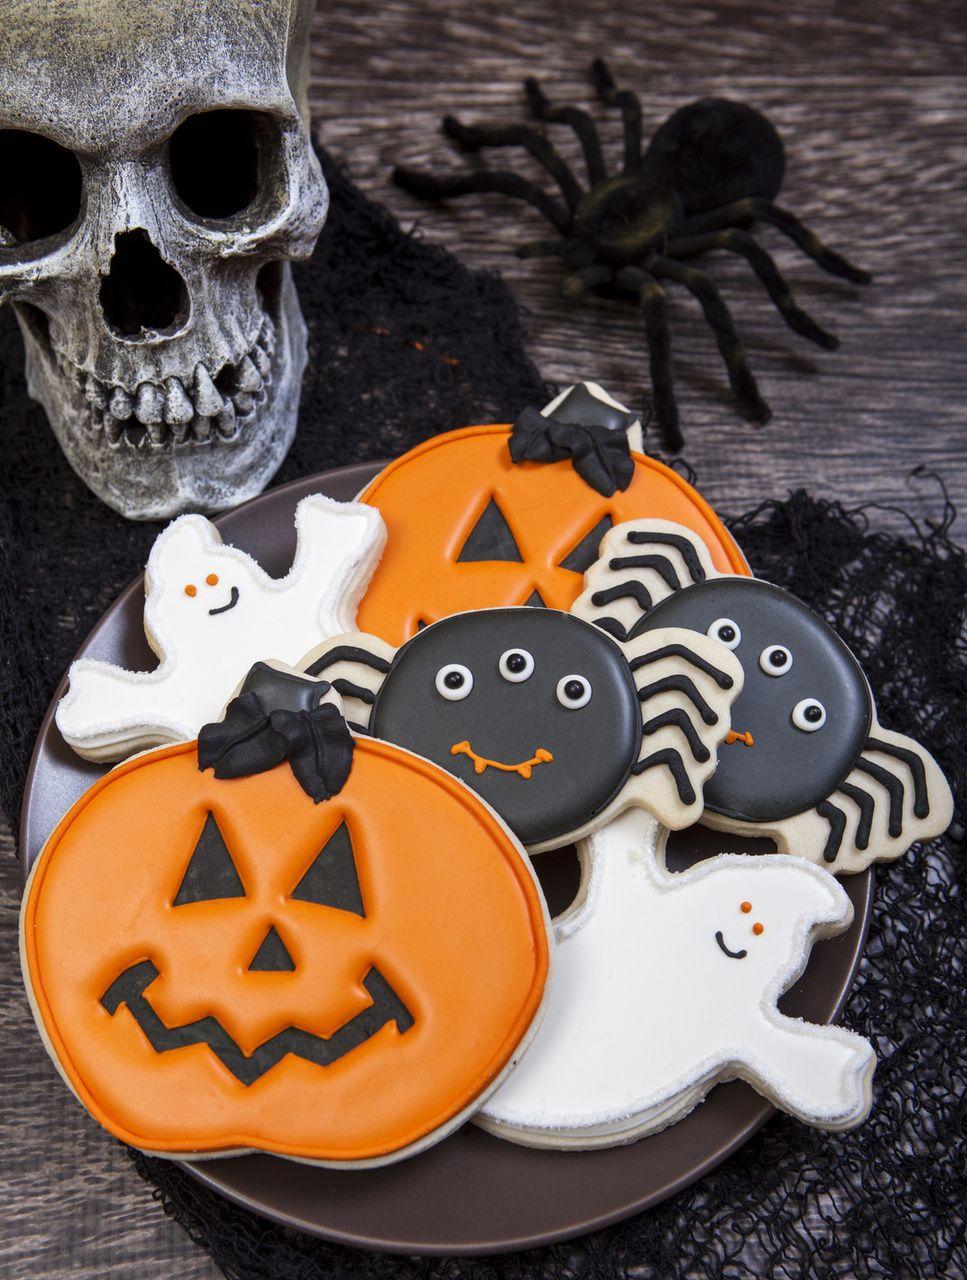 Spooky Cookie  Halloween Cookie Decorations